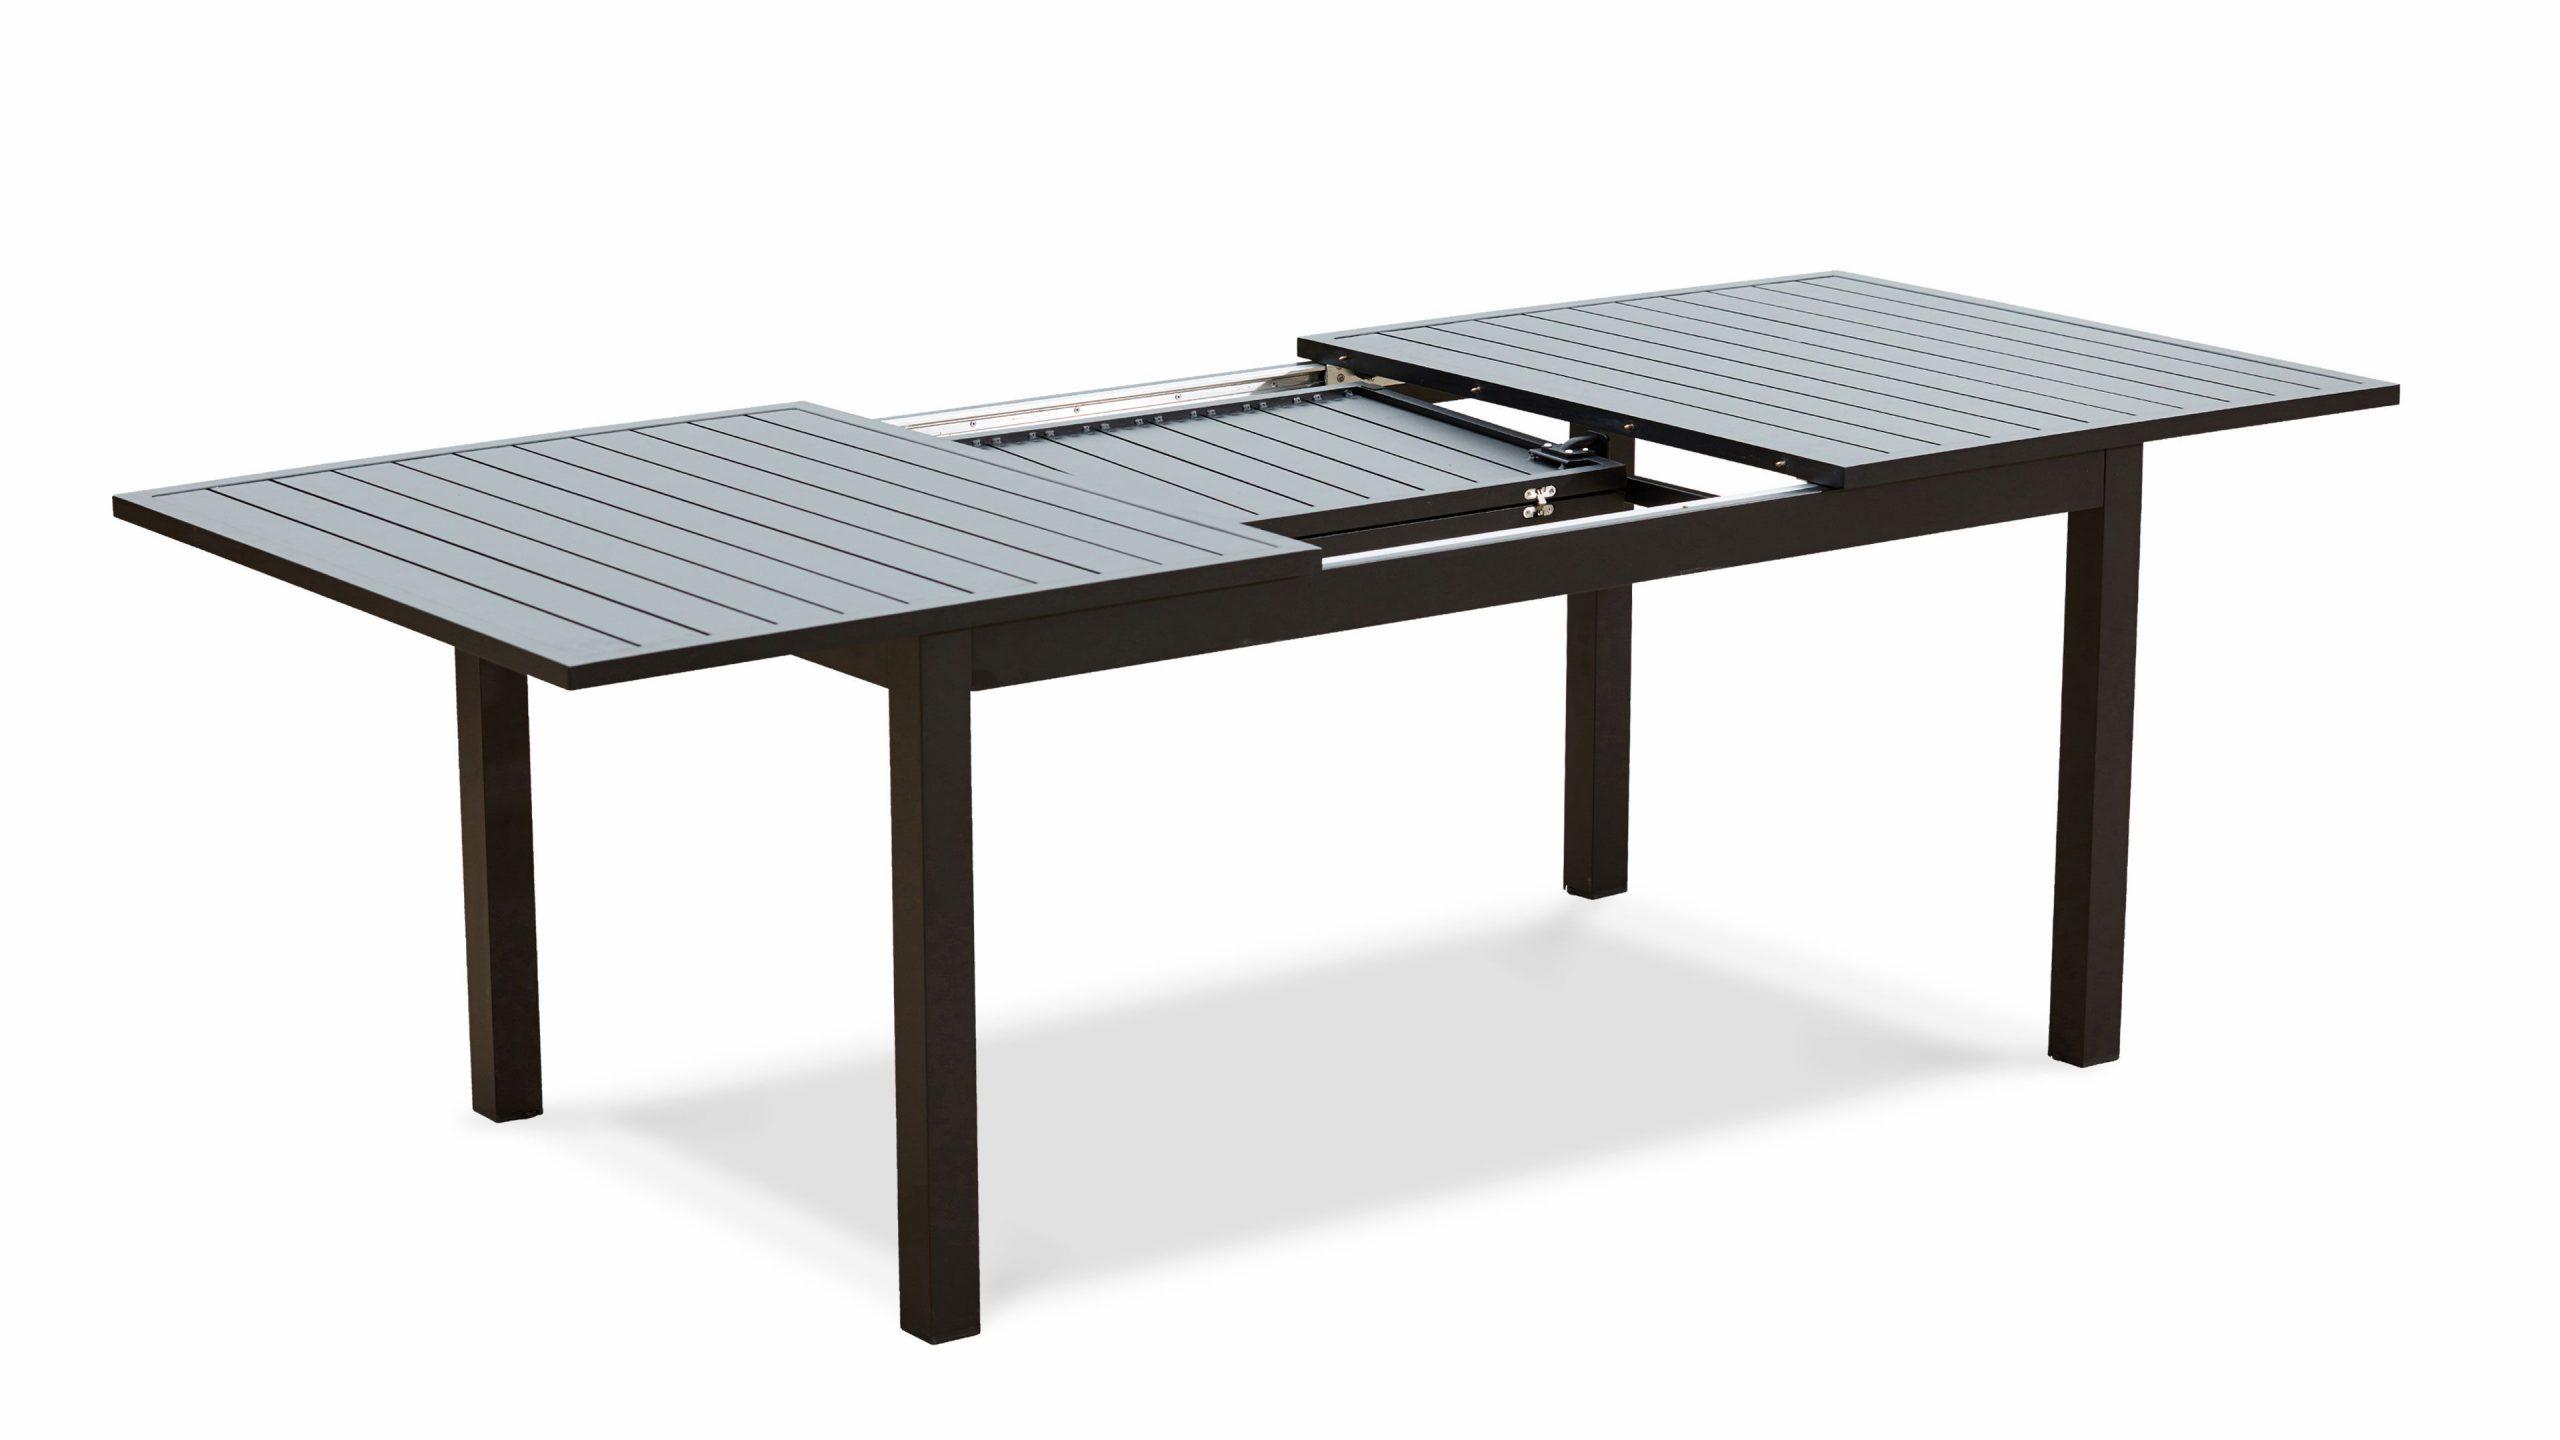 Table Jardin Extensible Rallonge 174/238 Cm Aluminium avec Table De Jardin Pas Cher